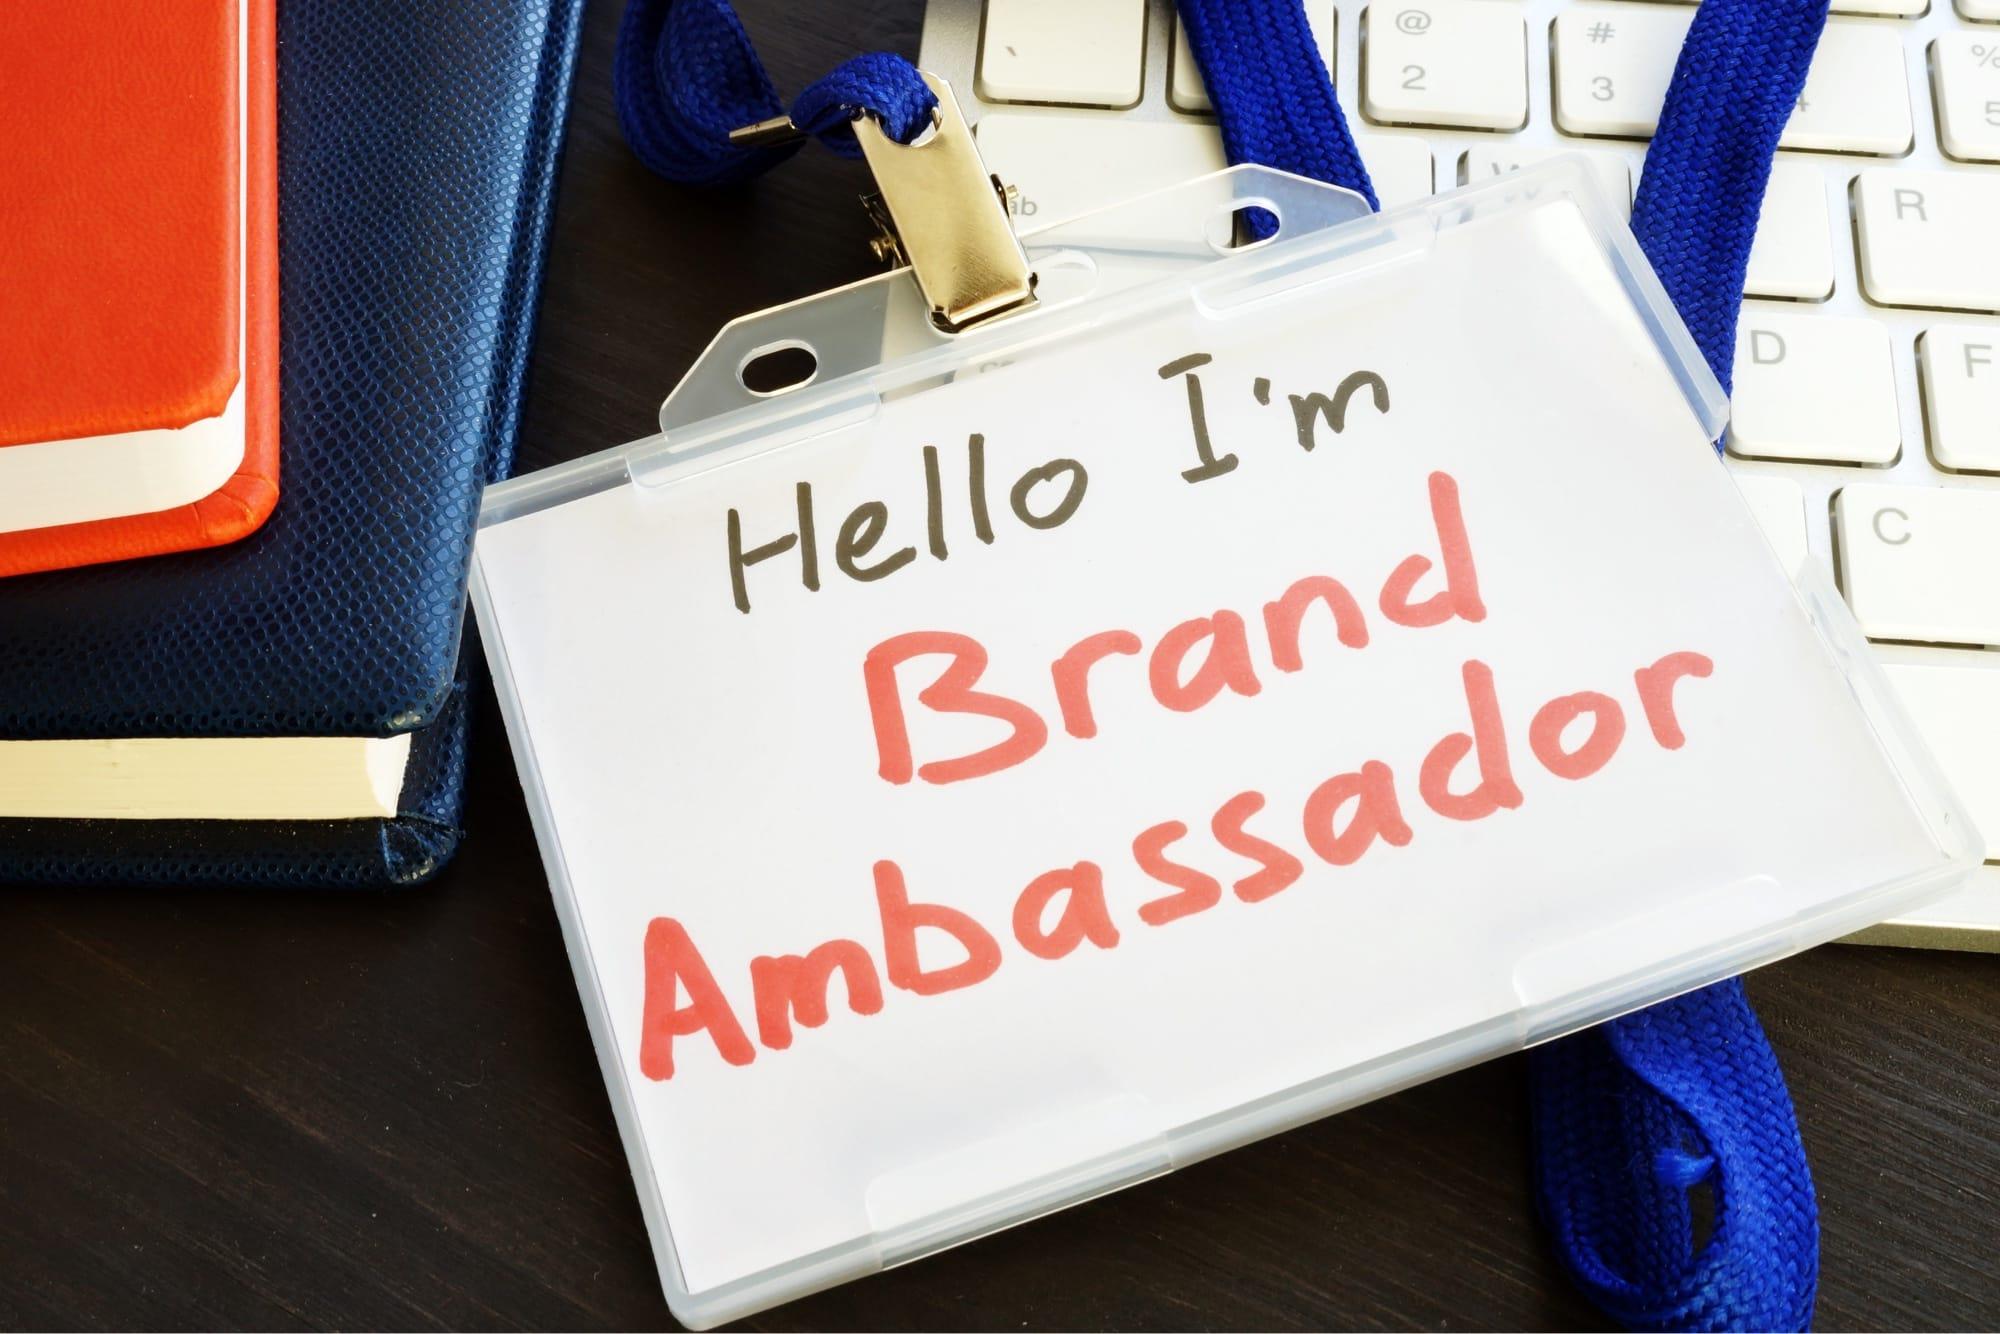 Hello I'm Ambassadorと書かれた名札